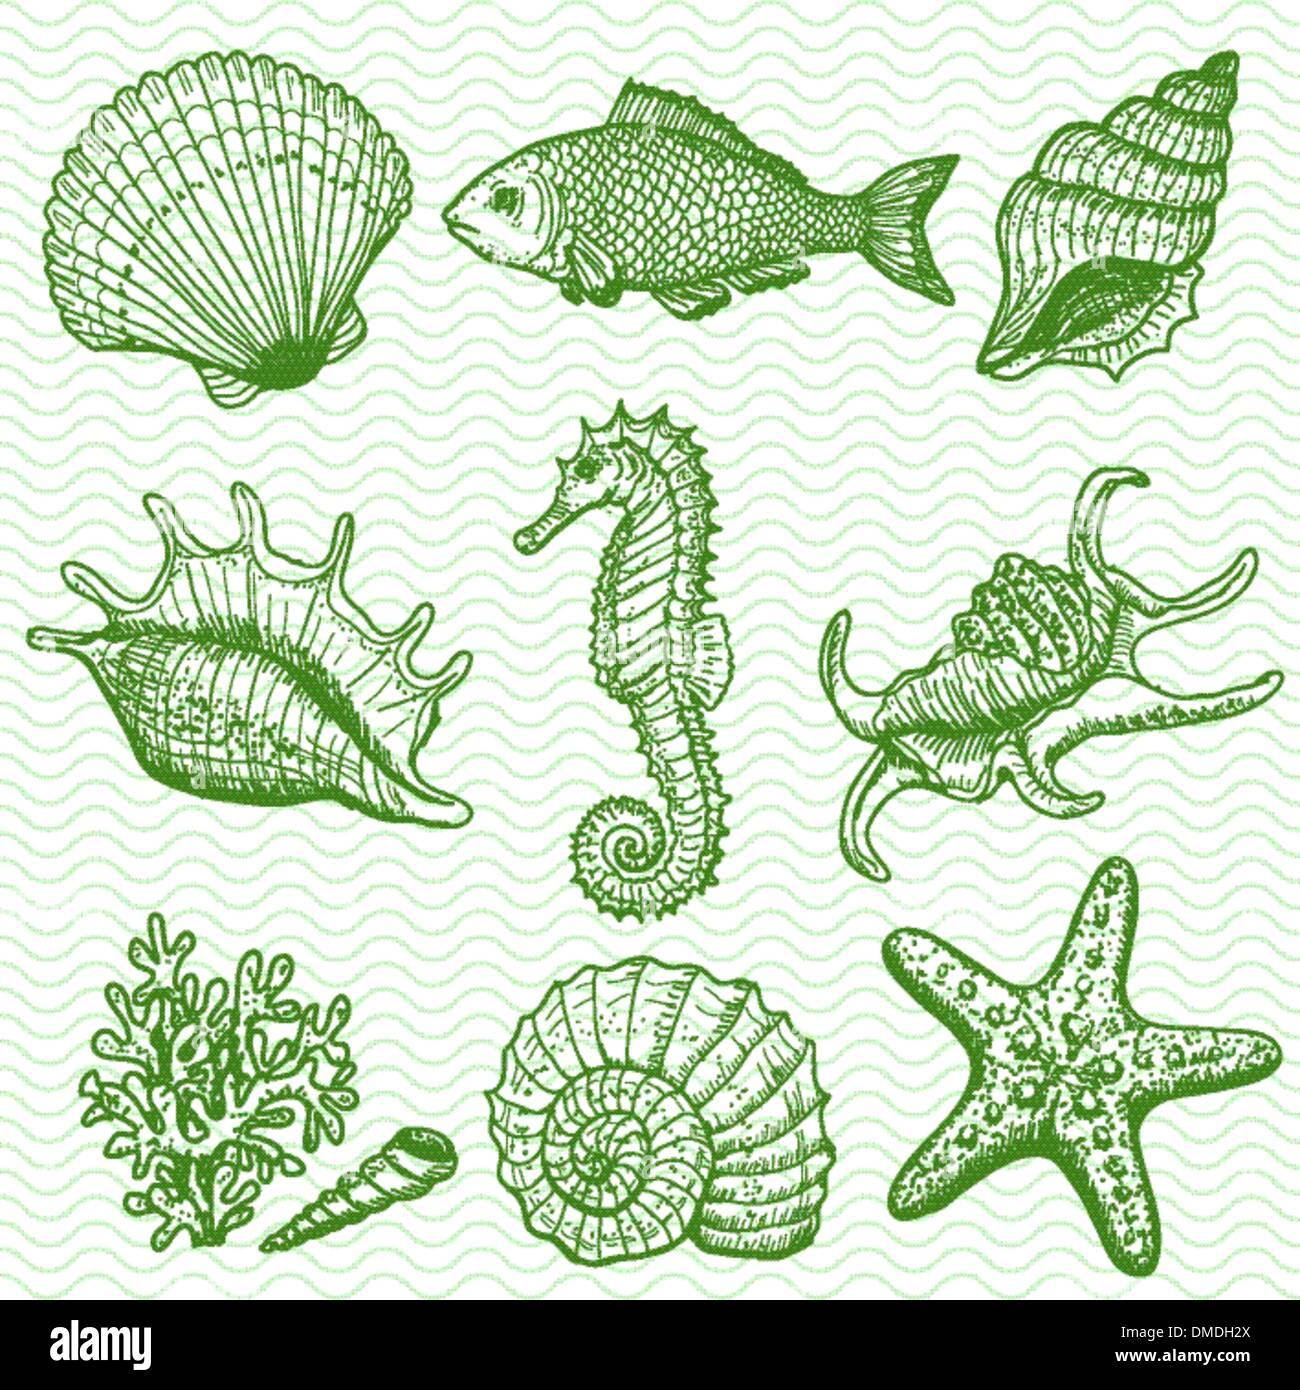 Hand Drawn Illustration Drawing Fish Stock Photos & Hand Drawn ...